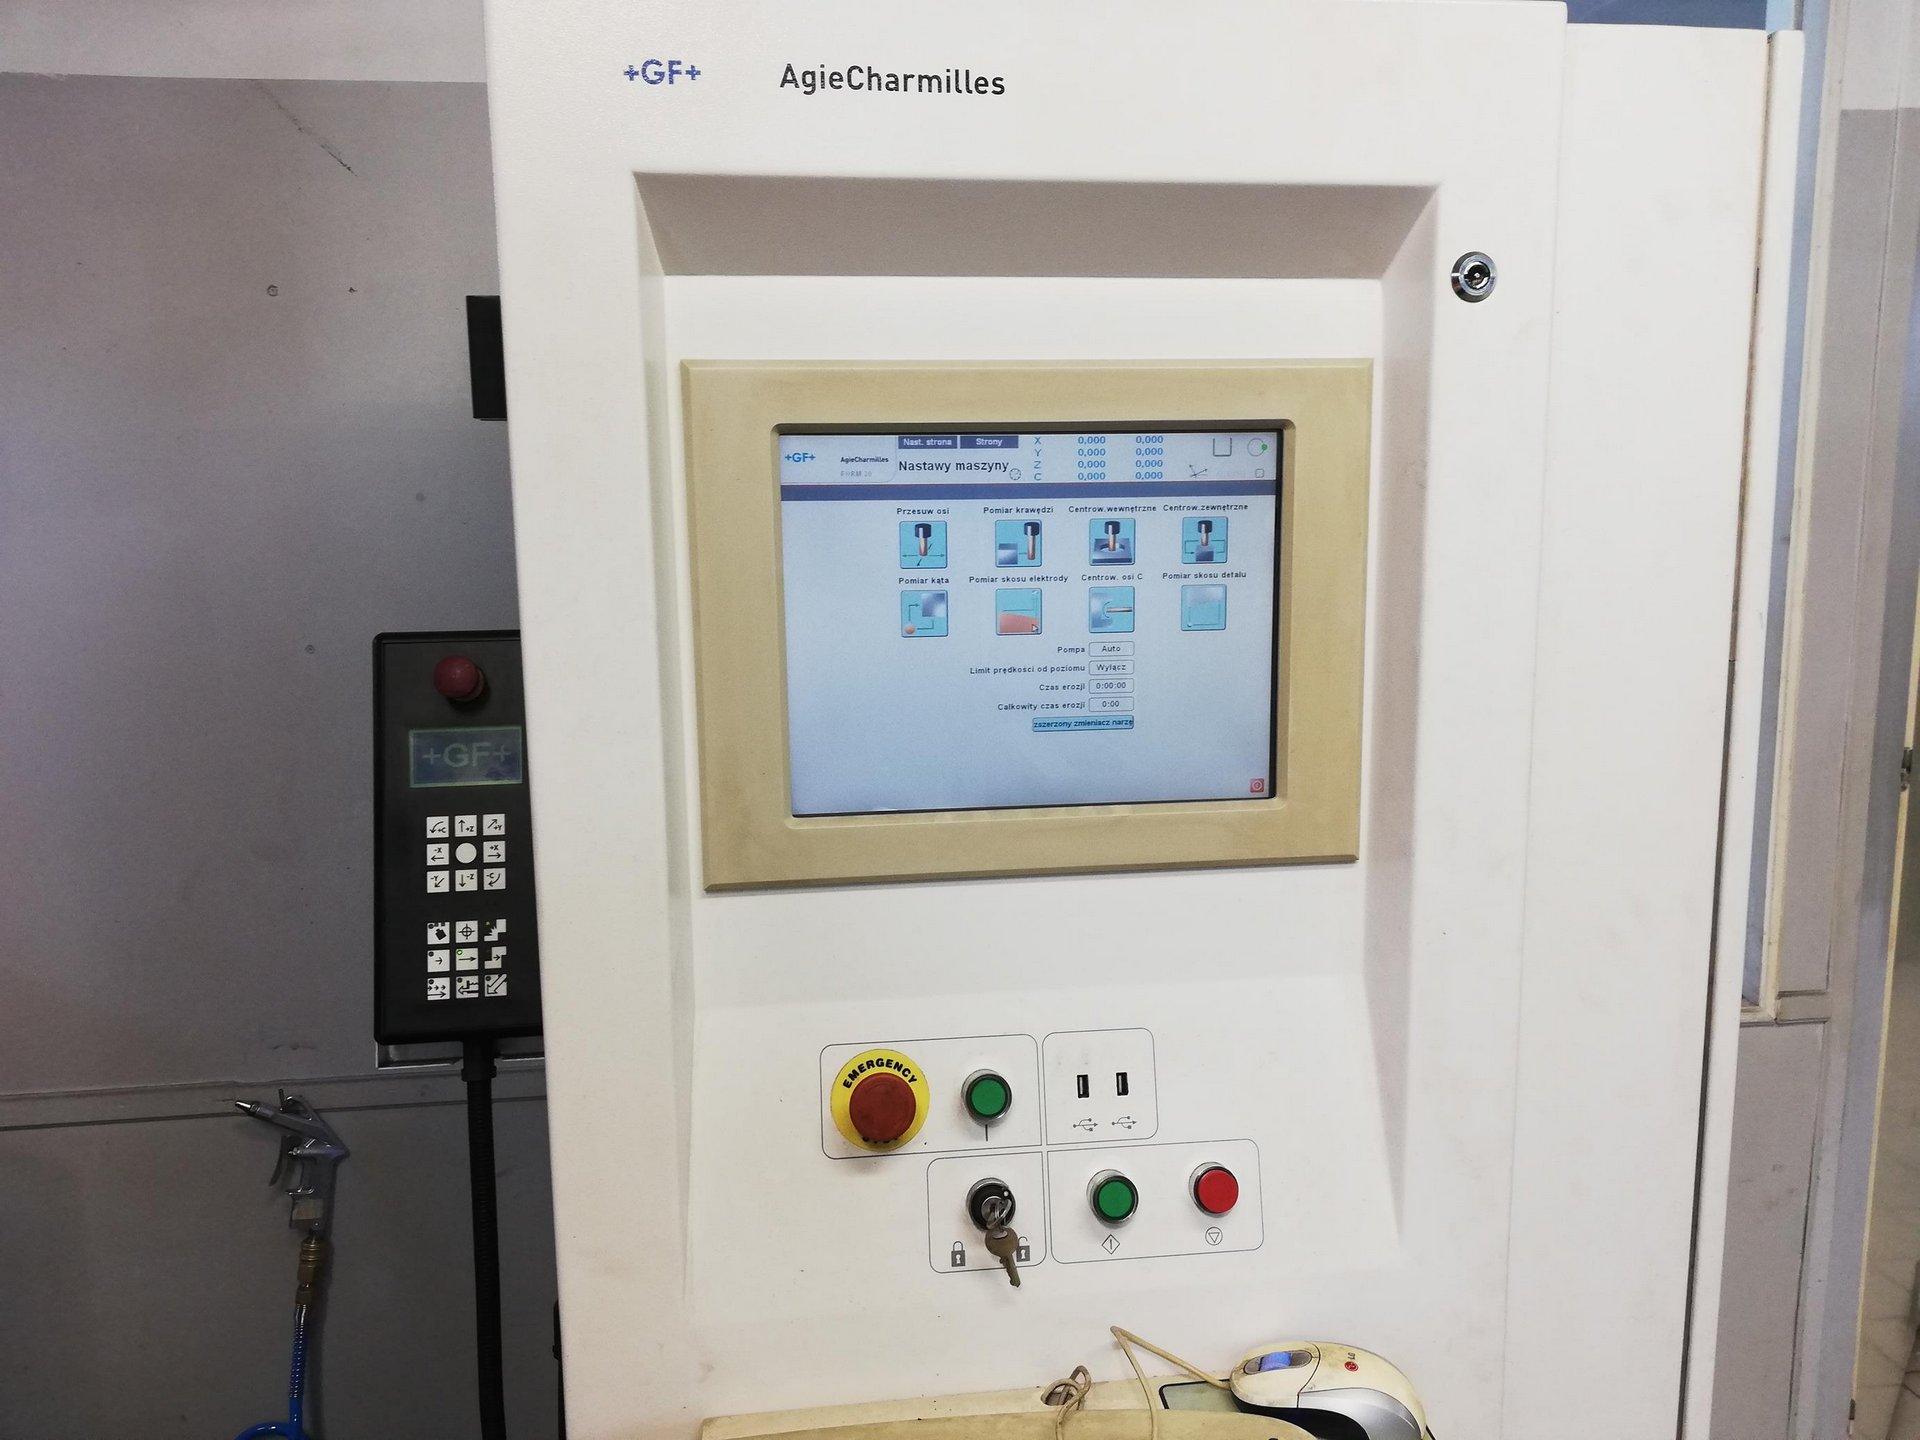 Elettroerosione a tuffo AGIE CHARMILLES FORM 20 in vendita - foto 5